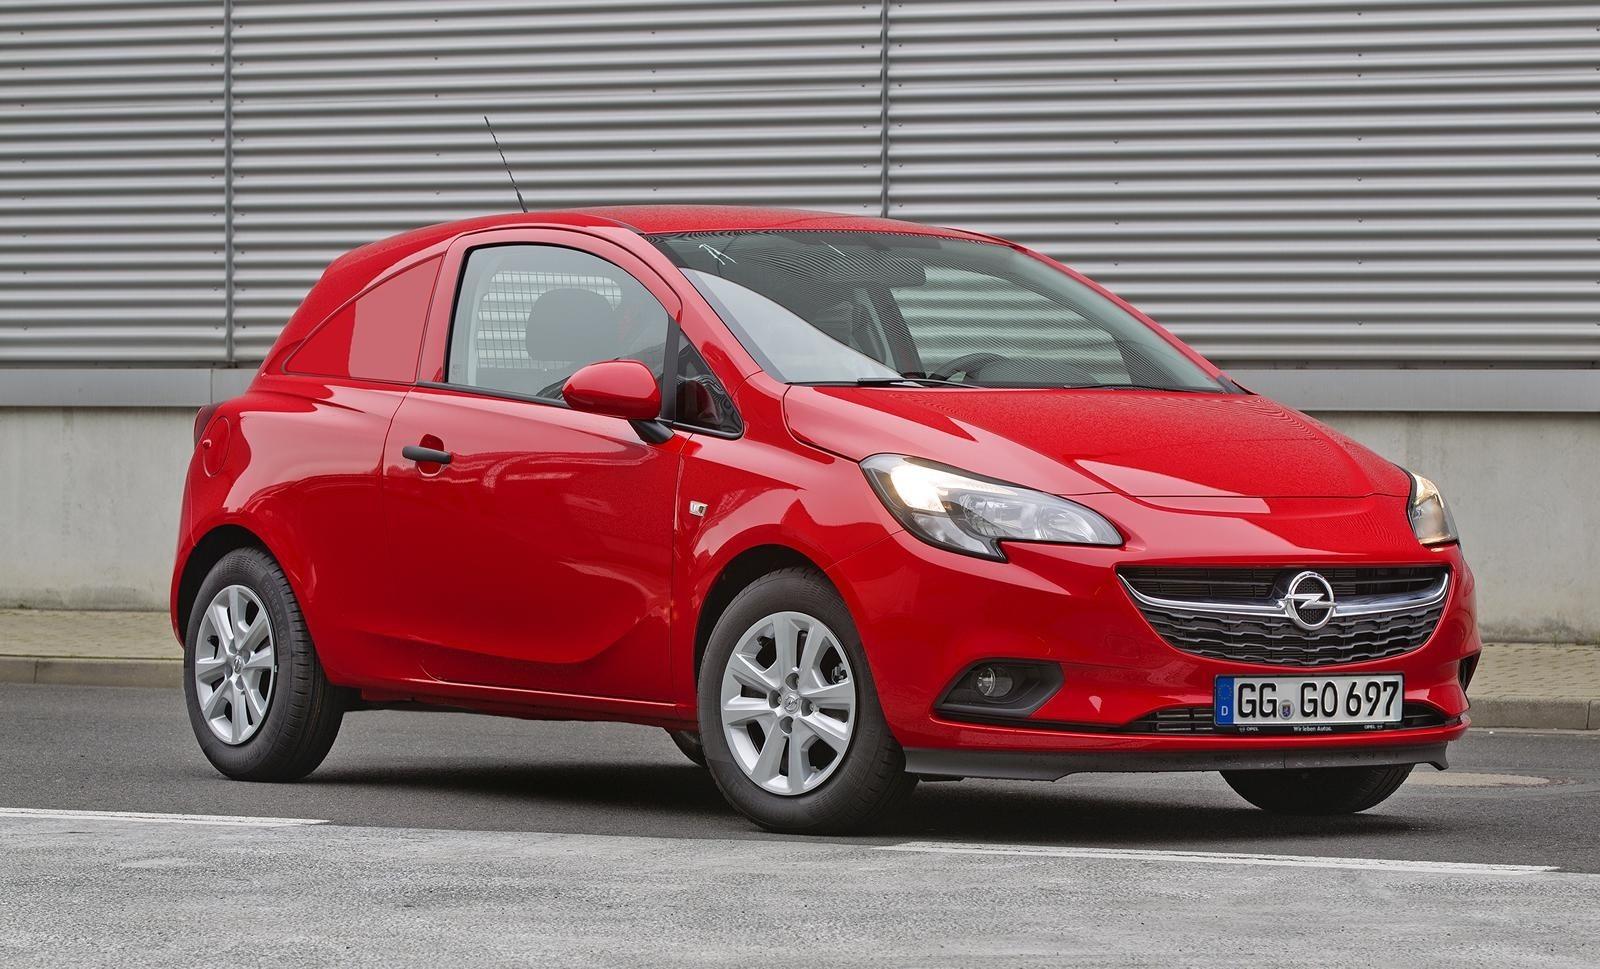 Photo of Opel Corsa pratik yüzünü gösterdi